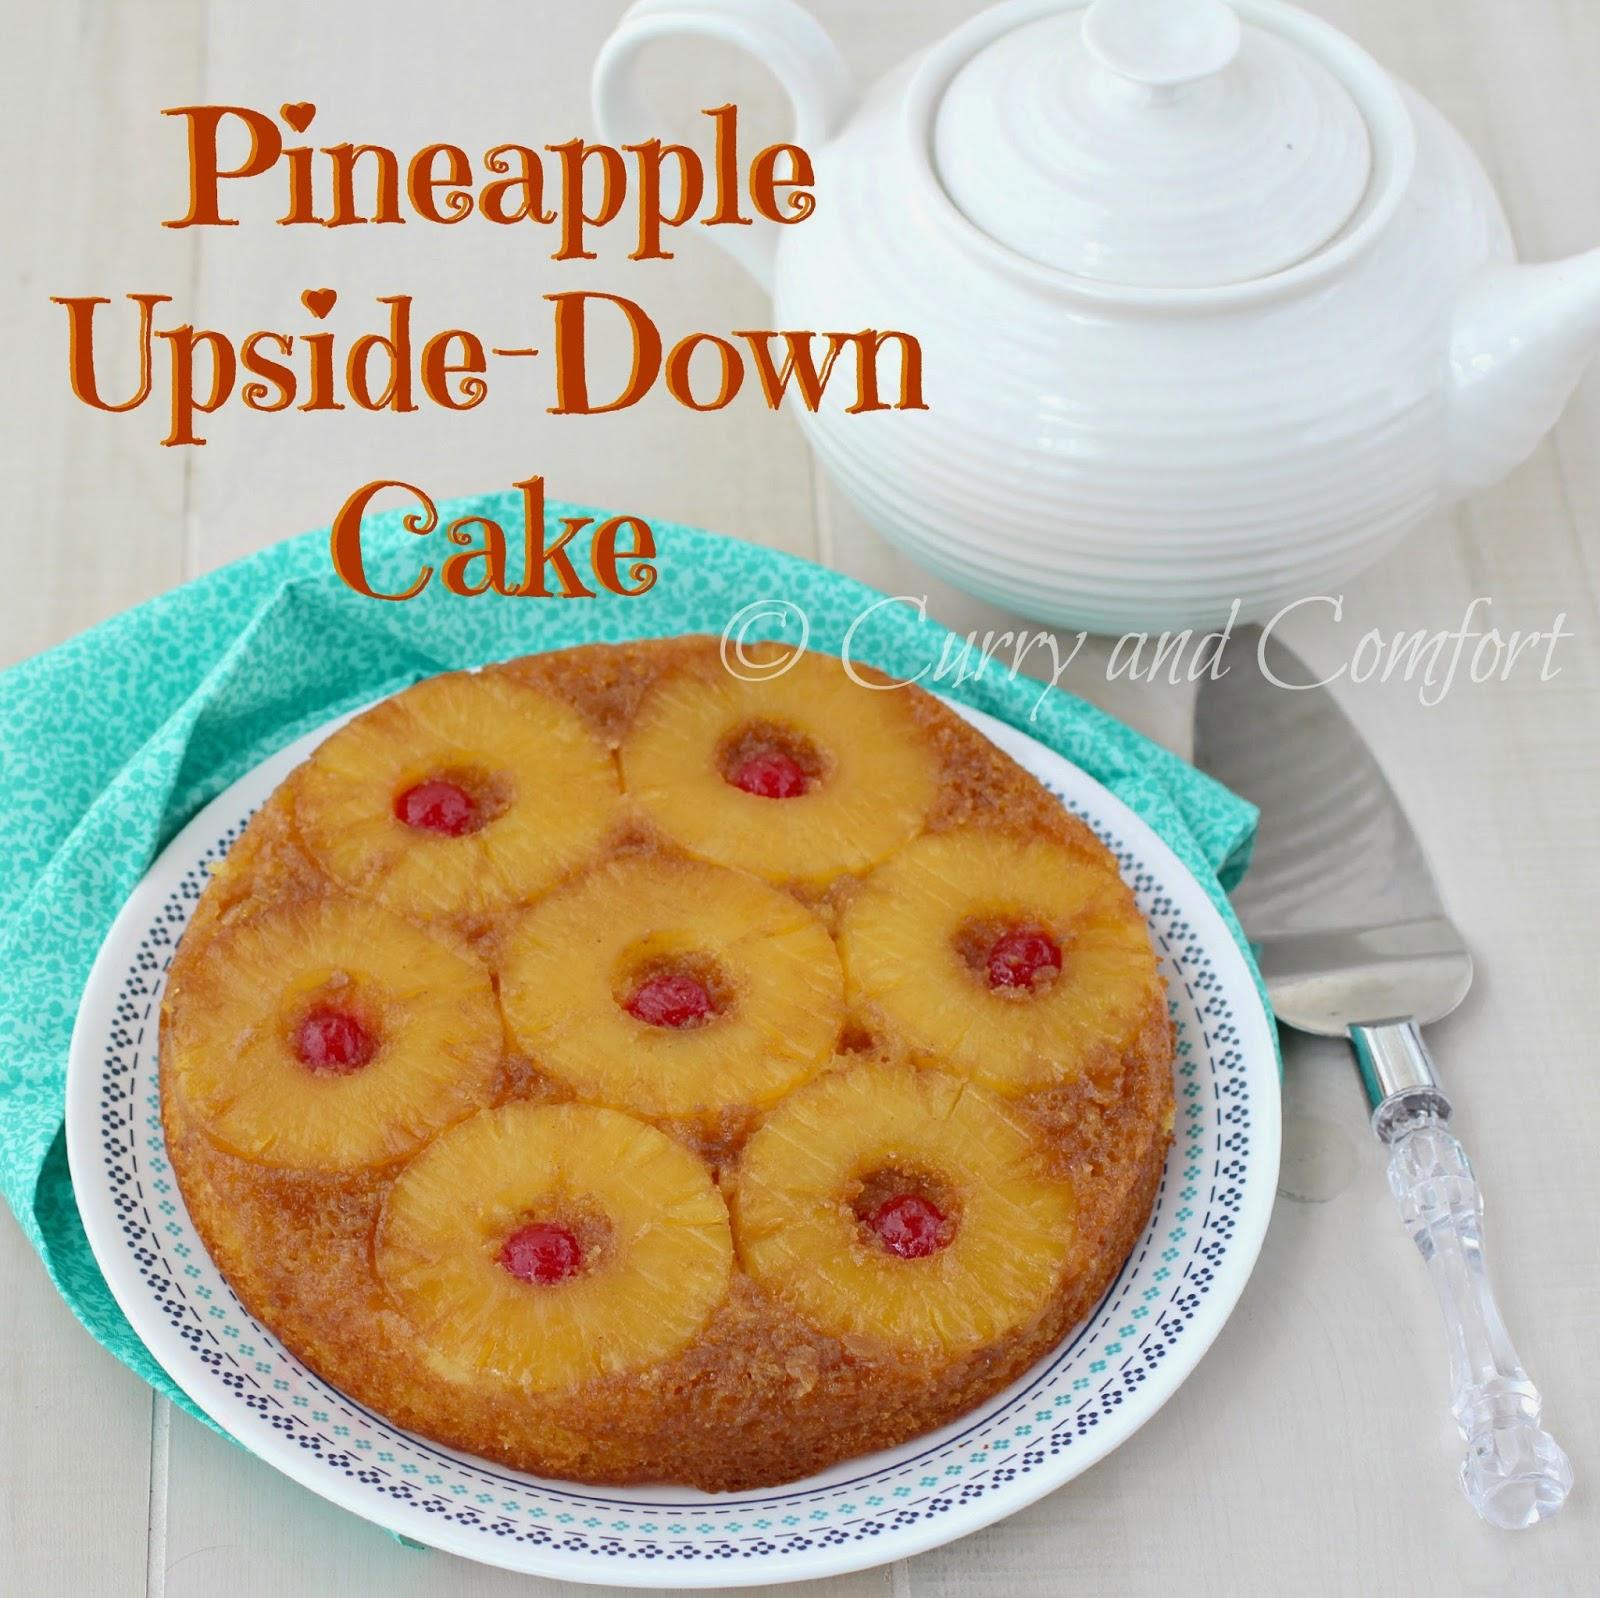 Easy Pineapple Upside Down Cake Using Cake Mix